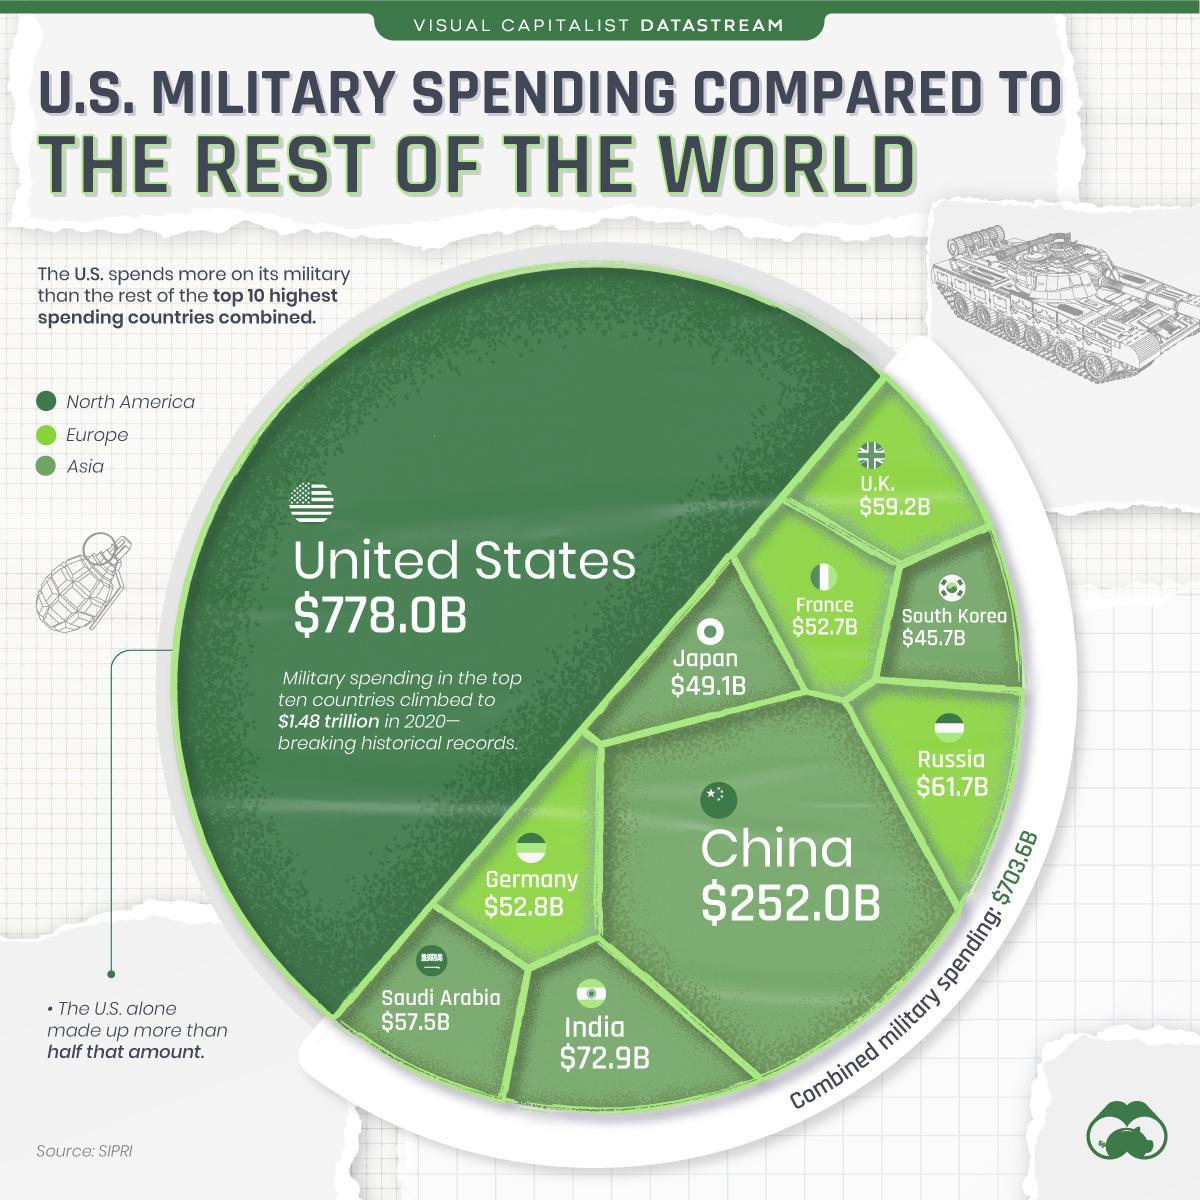 https://cms.zerohedge.com/s3/files/inline-images/U.S-Military-Vs.ROW_Maingraphic.jpg?itok=8Wxb3uUE